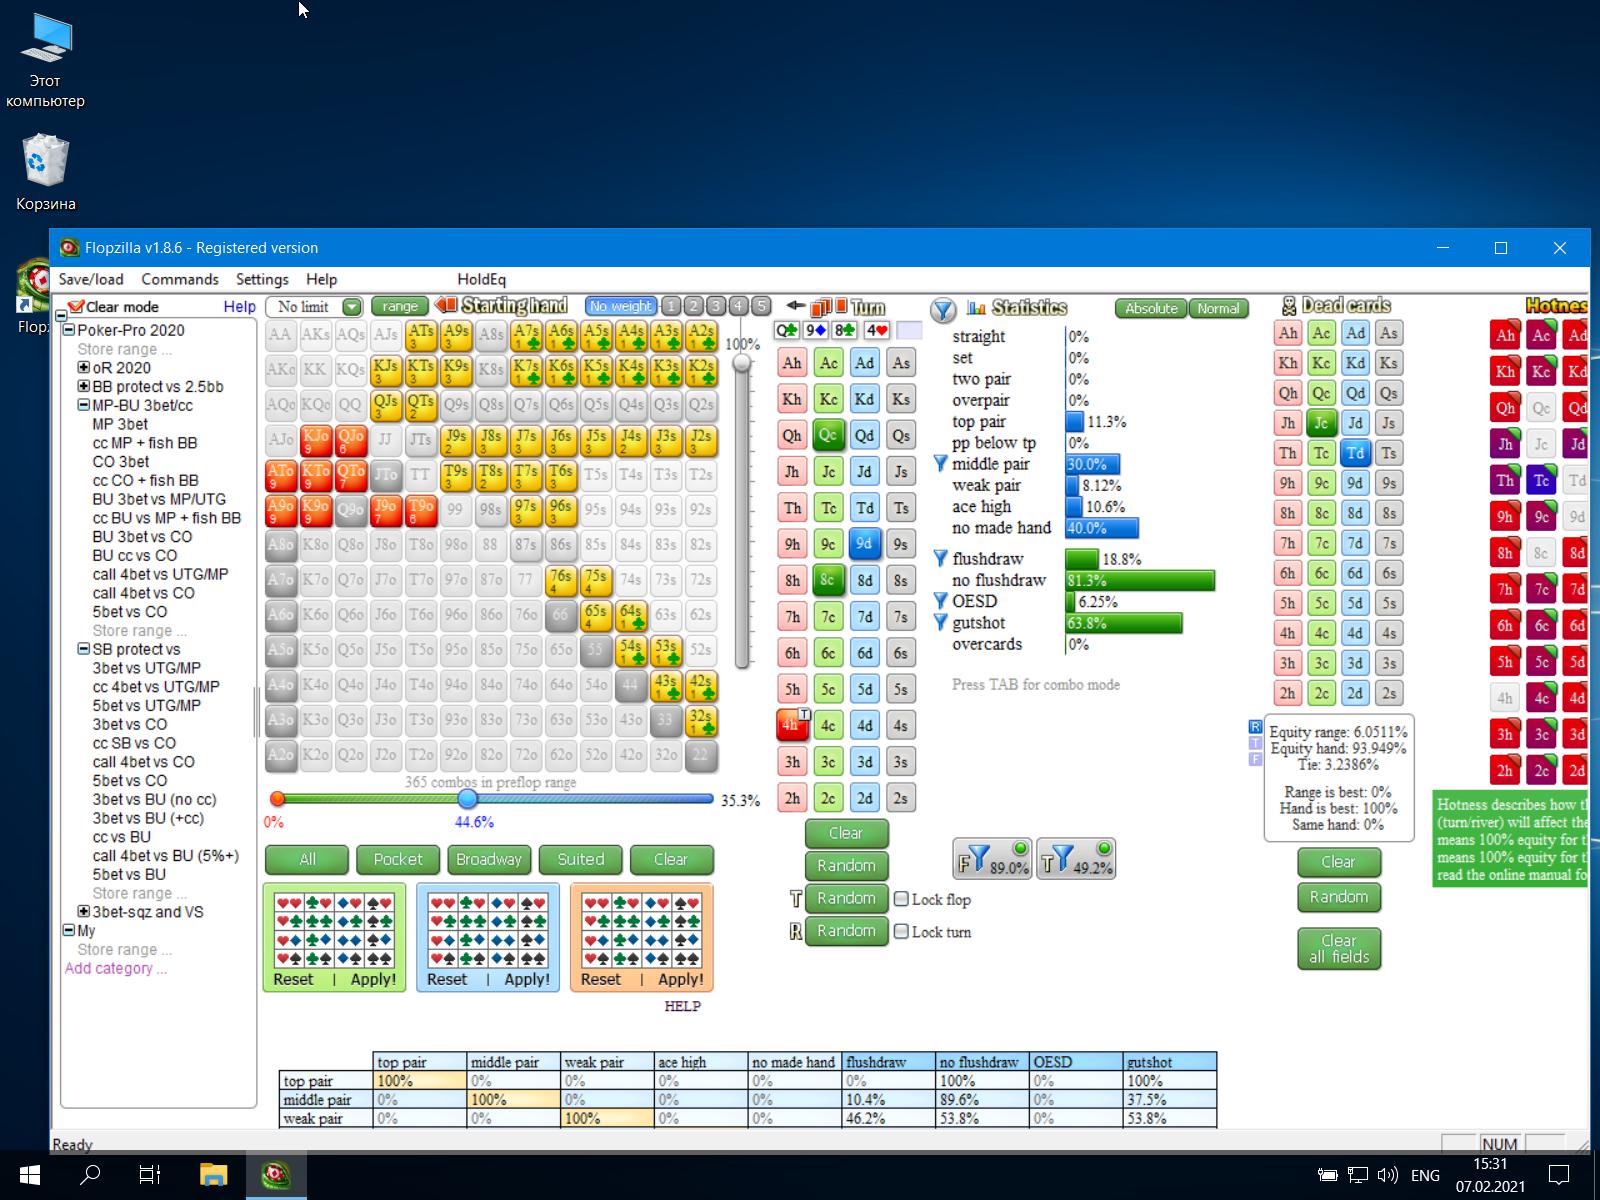 virtualboxwin-10070220211535581612701375.png